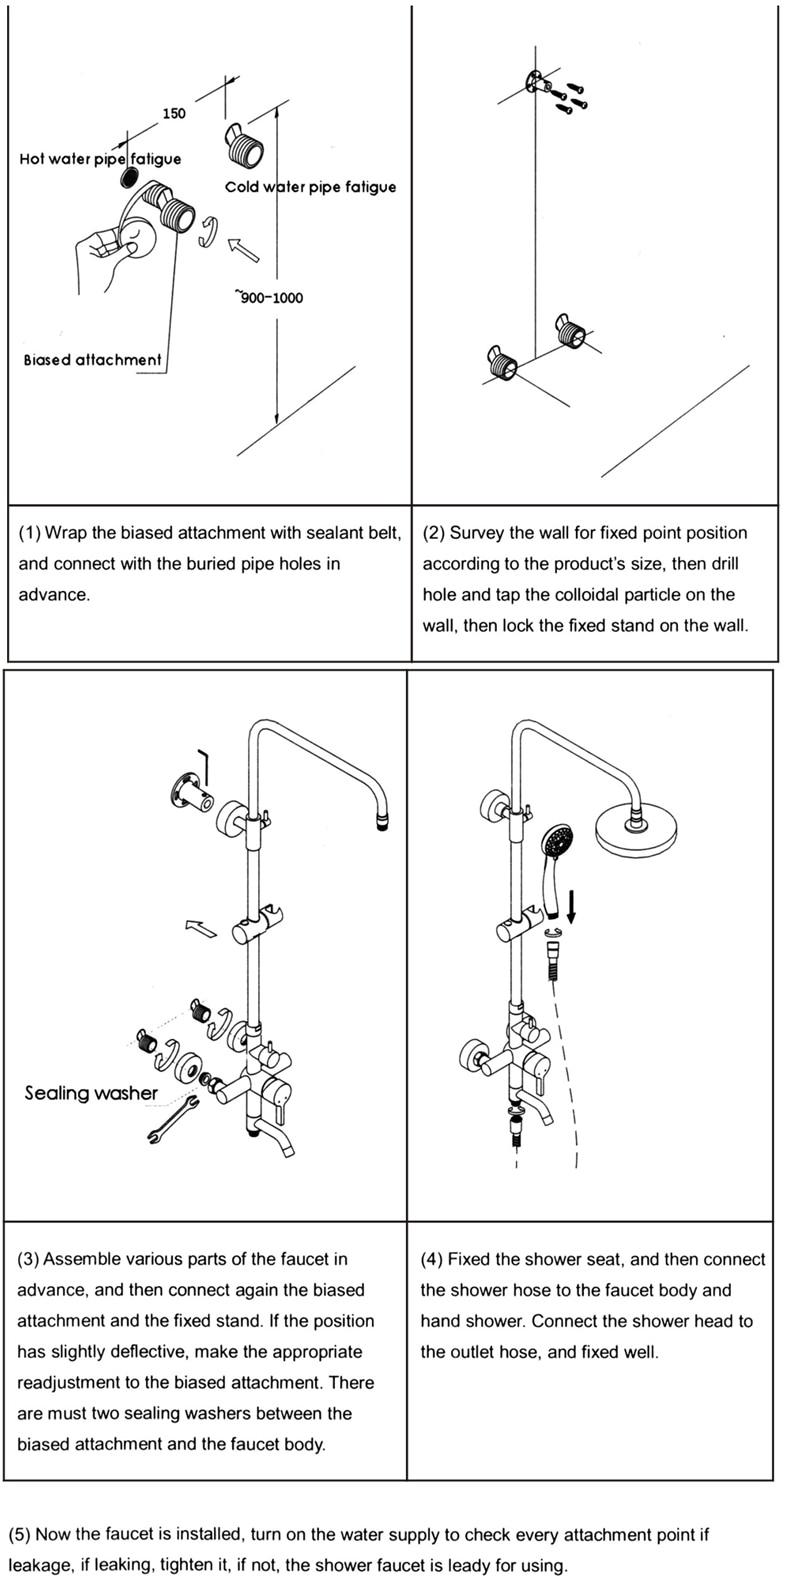 HTB1MycPQsfpK1RjSZFOq6y6nFXan Senducs Thermostatic Shower Set White Gold Bathroom Shower System Quality Brass Bathtub Faucet Newly Intelligent Gold Shower Set